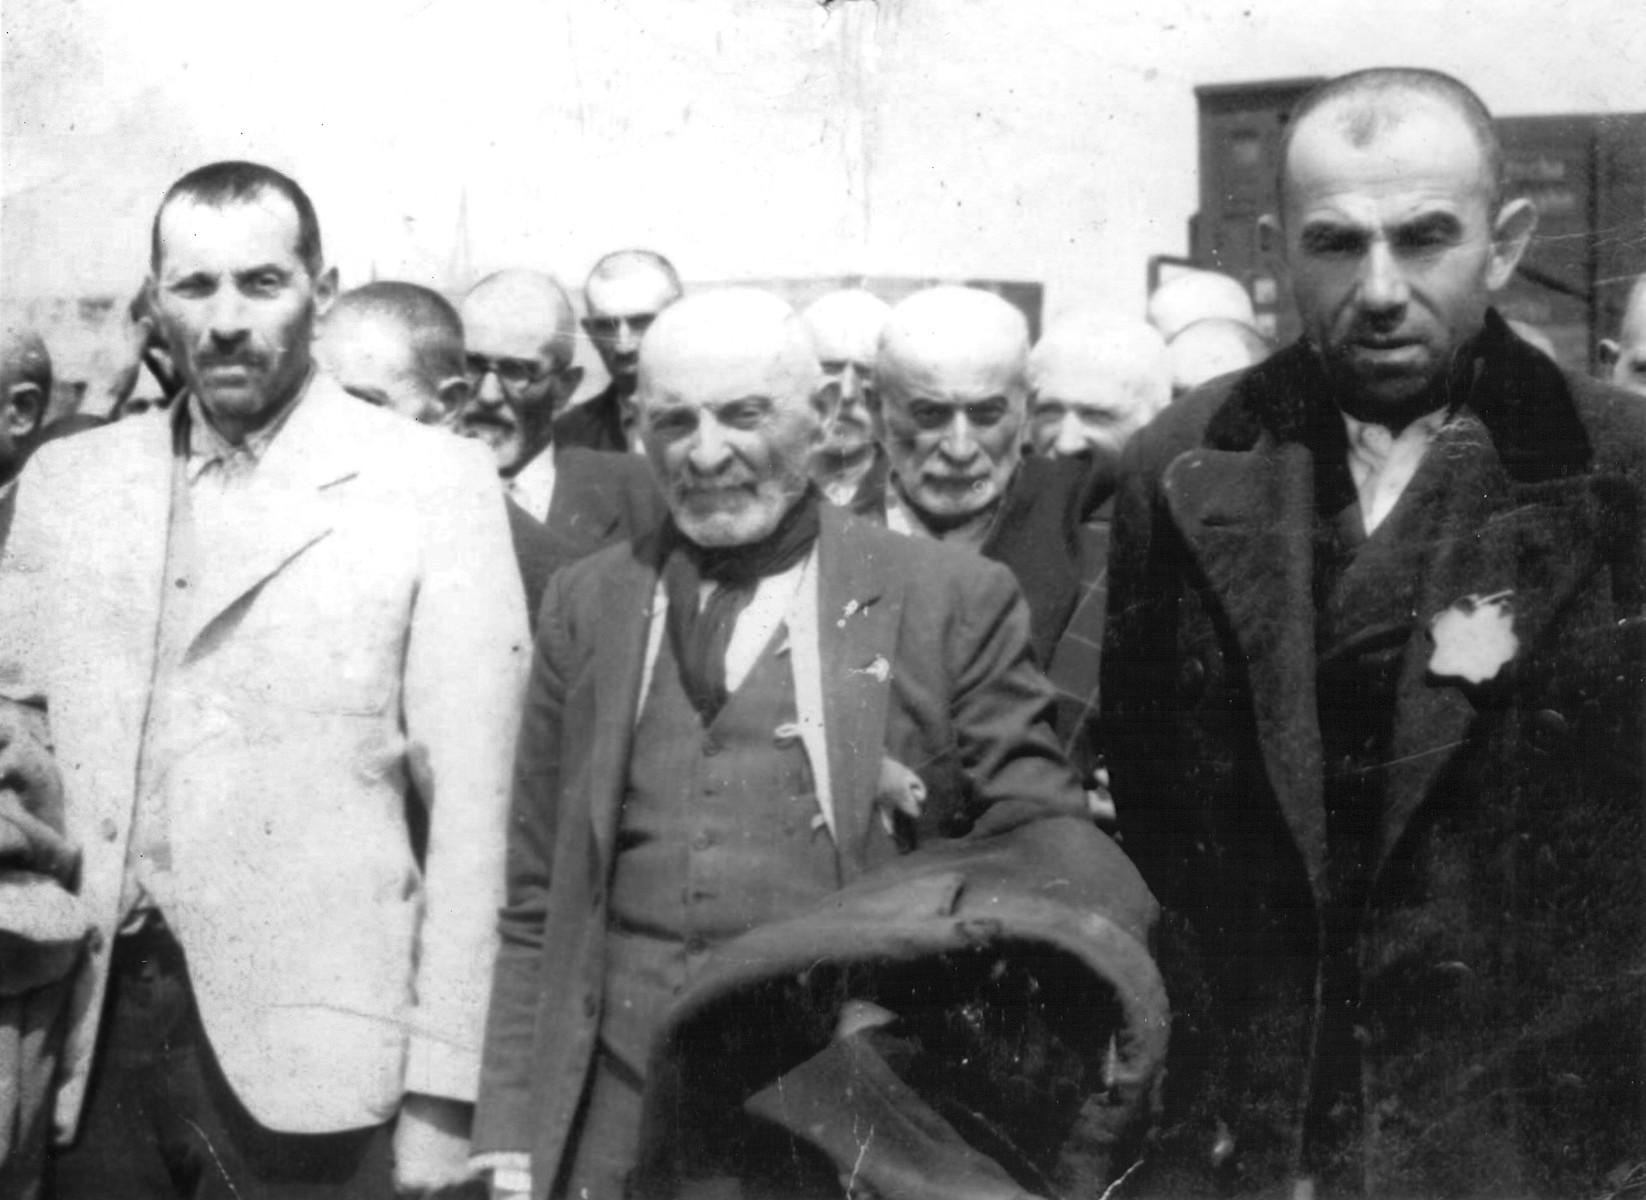 Jews from Subcarpathian Rus await selection on the ramp at Auschwitz-Birkenau.